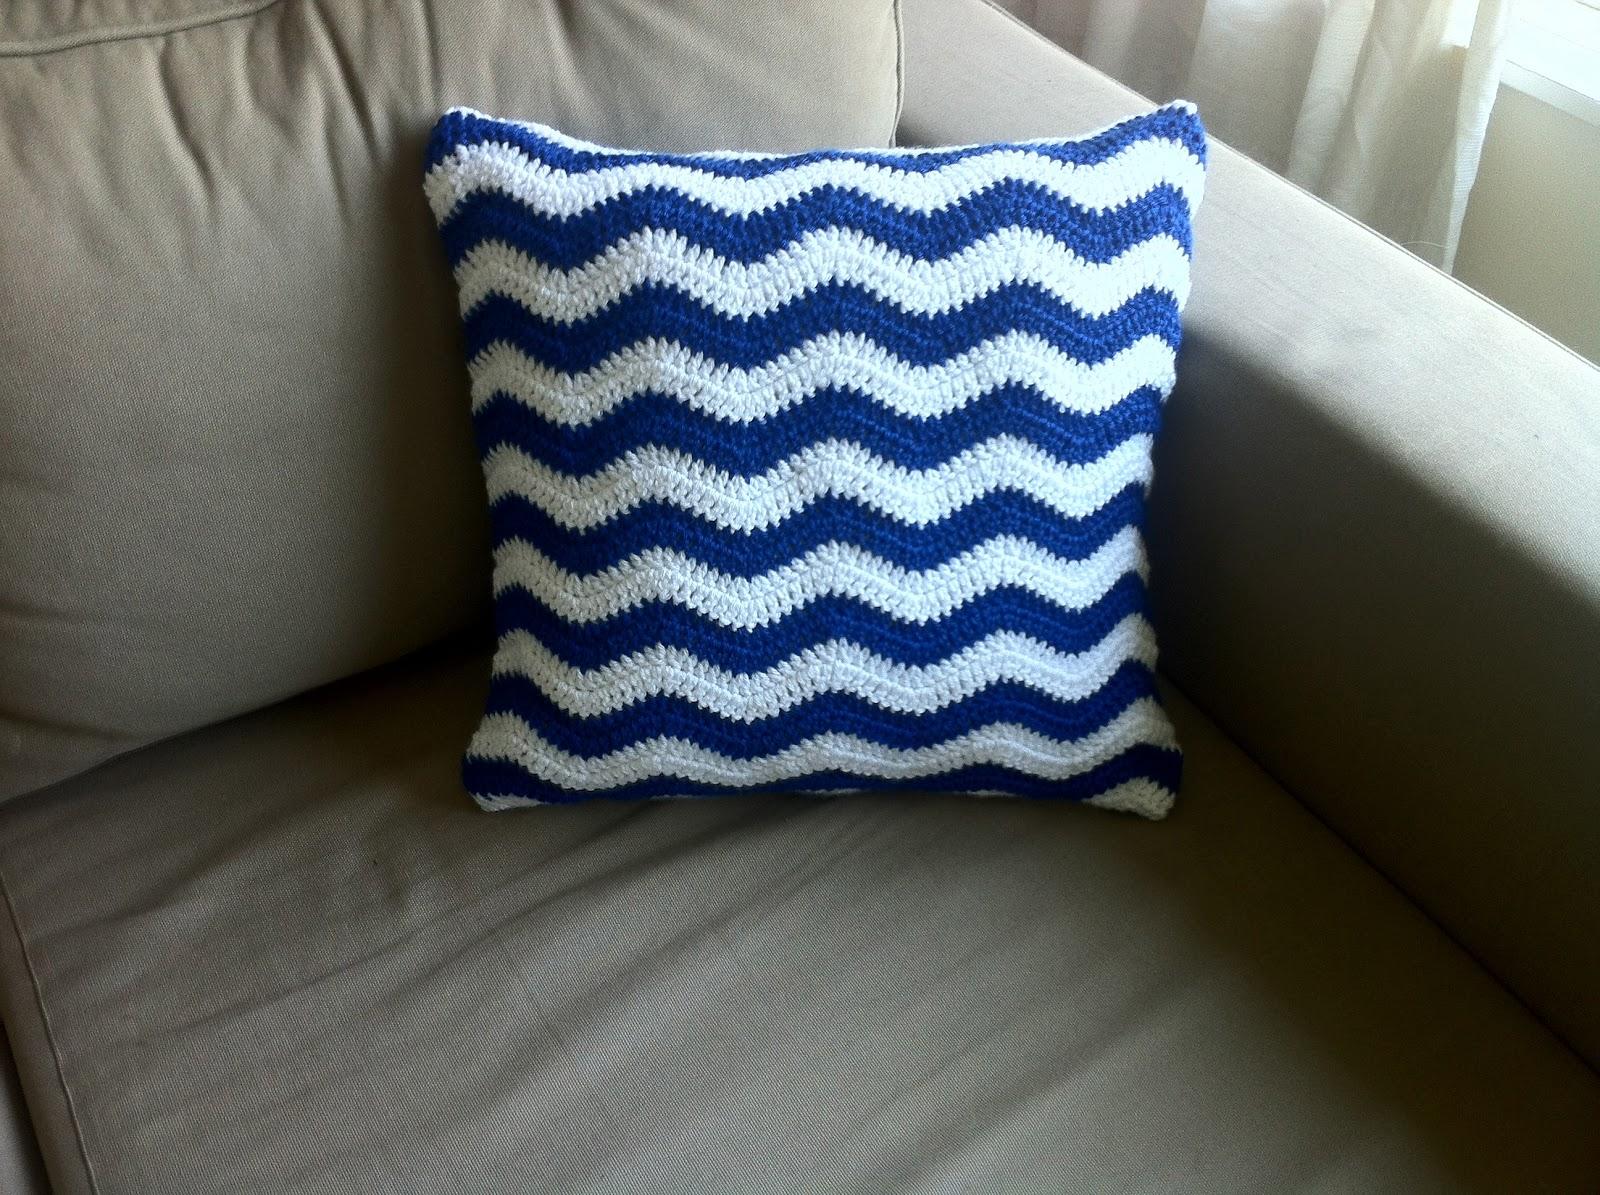 Nautical Cushion Knitting Pattern : The Way I Crochet: Nautical Cushion Covers